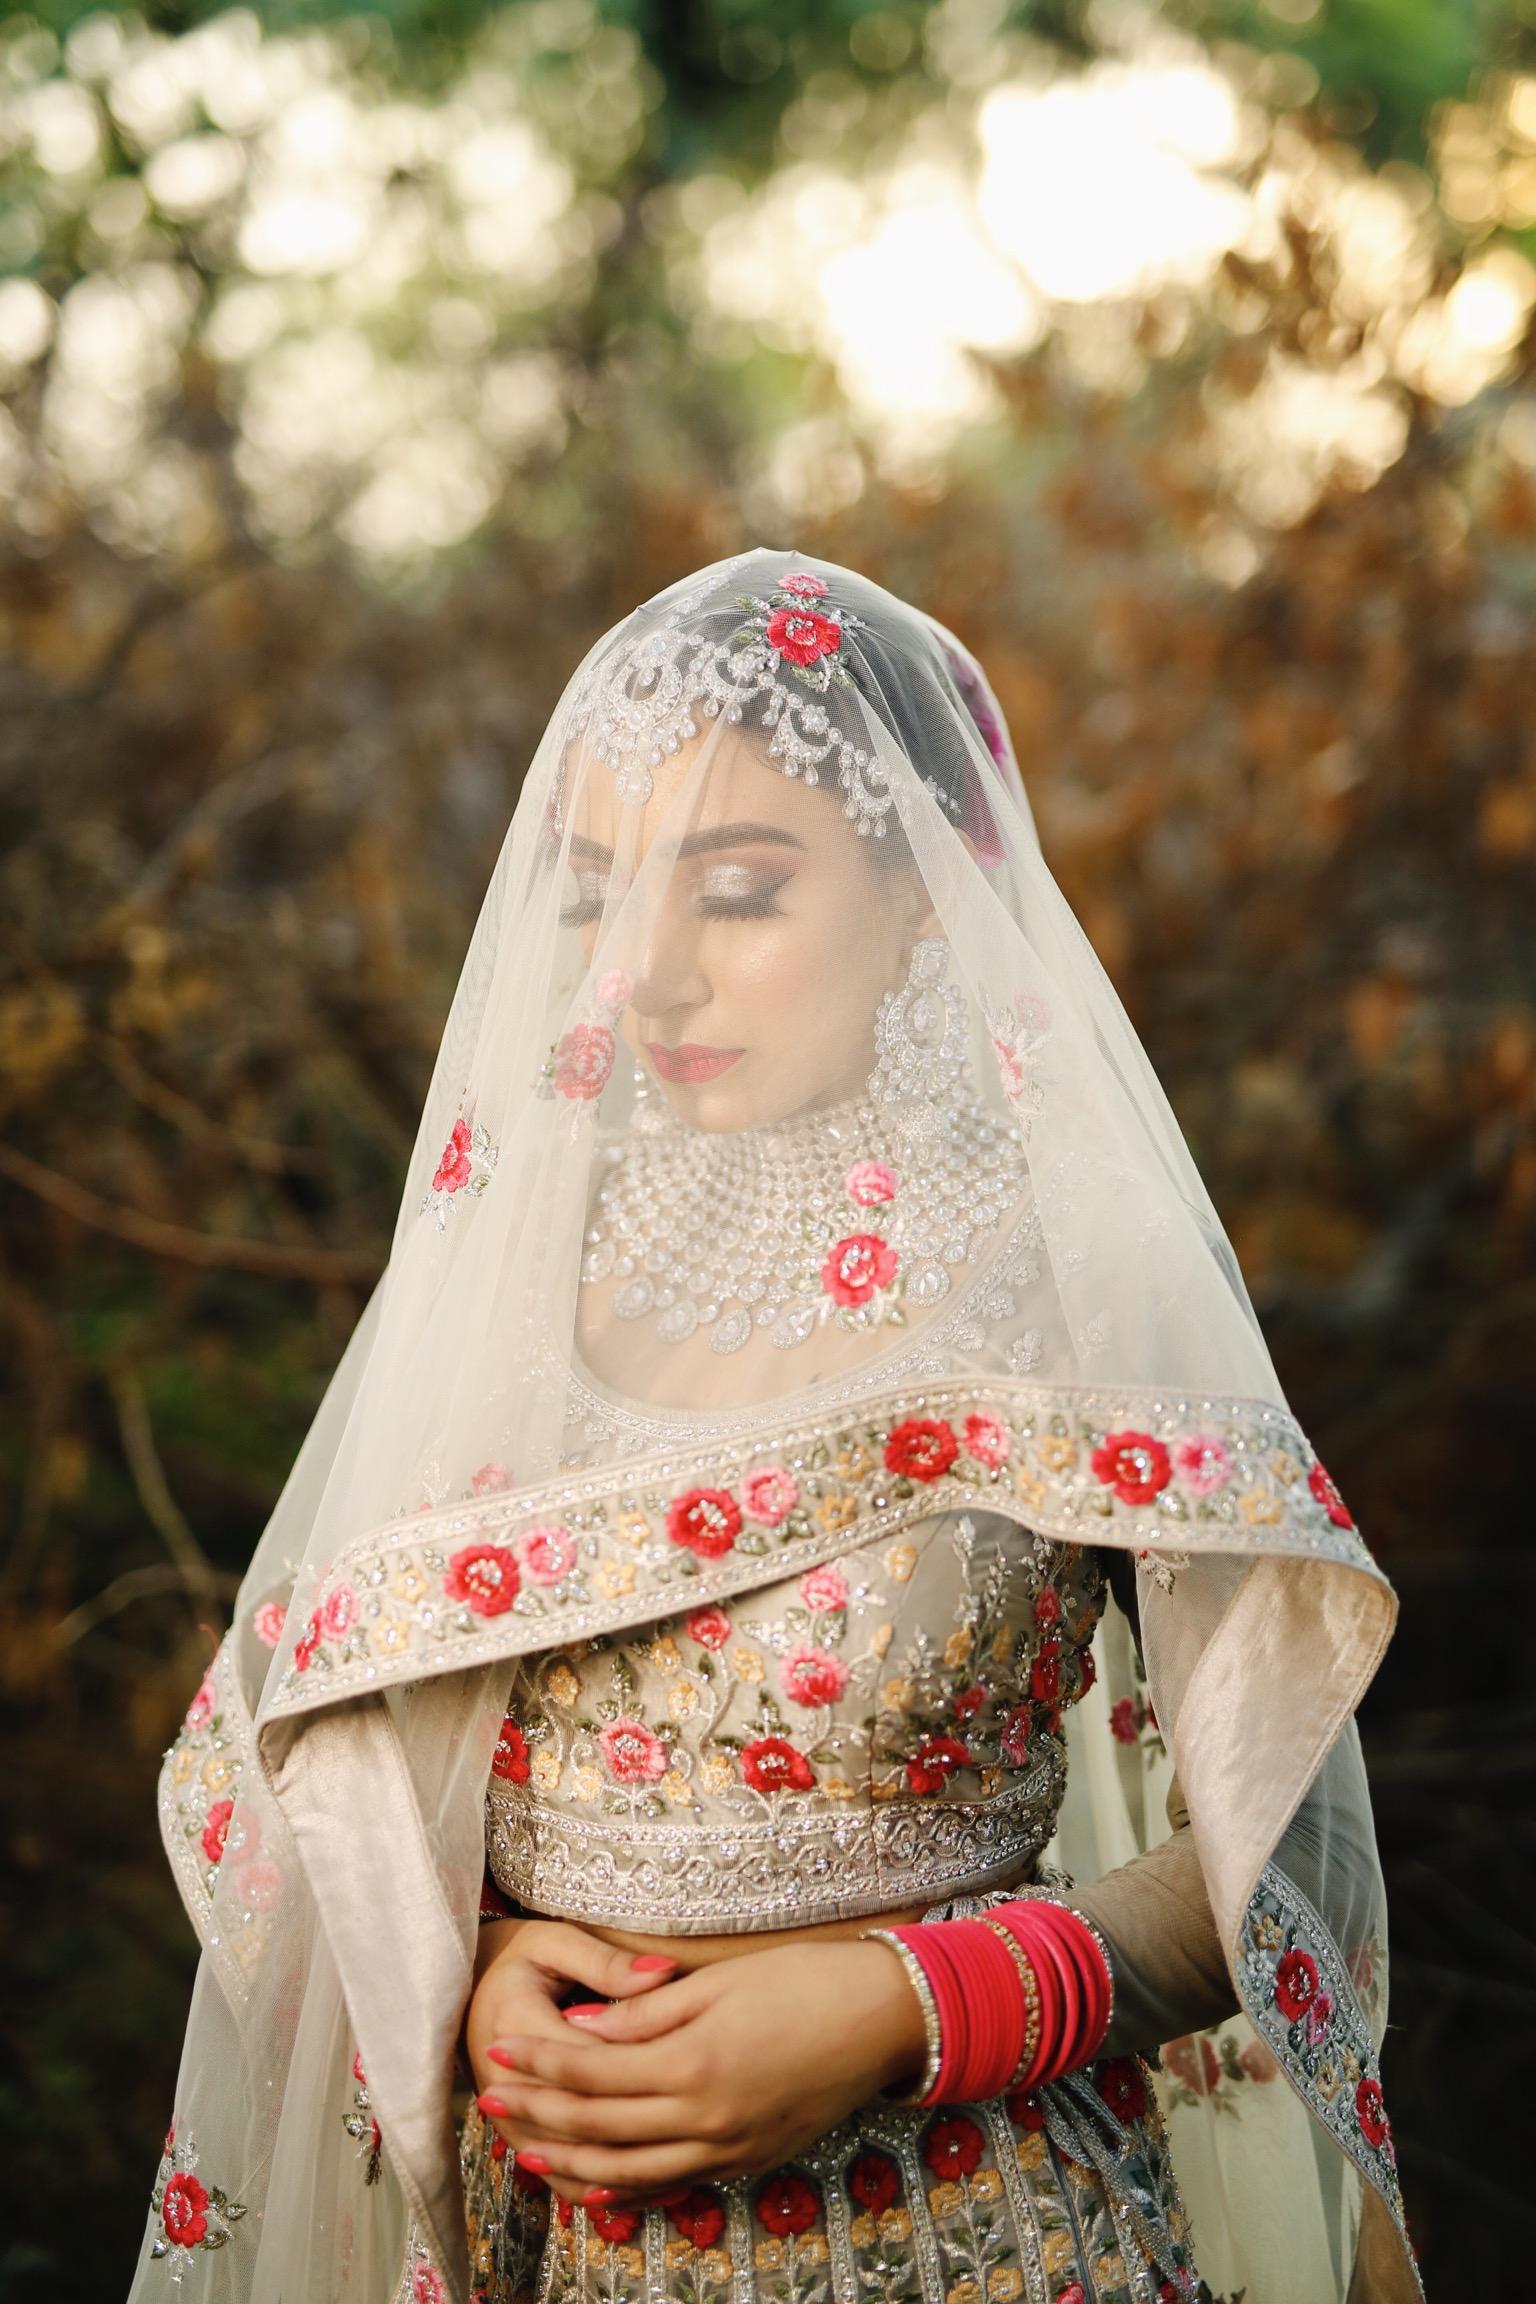 paramjeet-kaur-makeup-artist-delhi-ncr